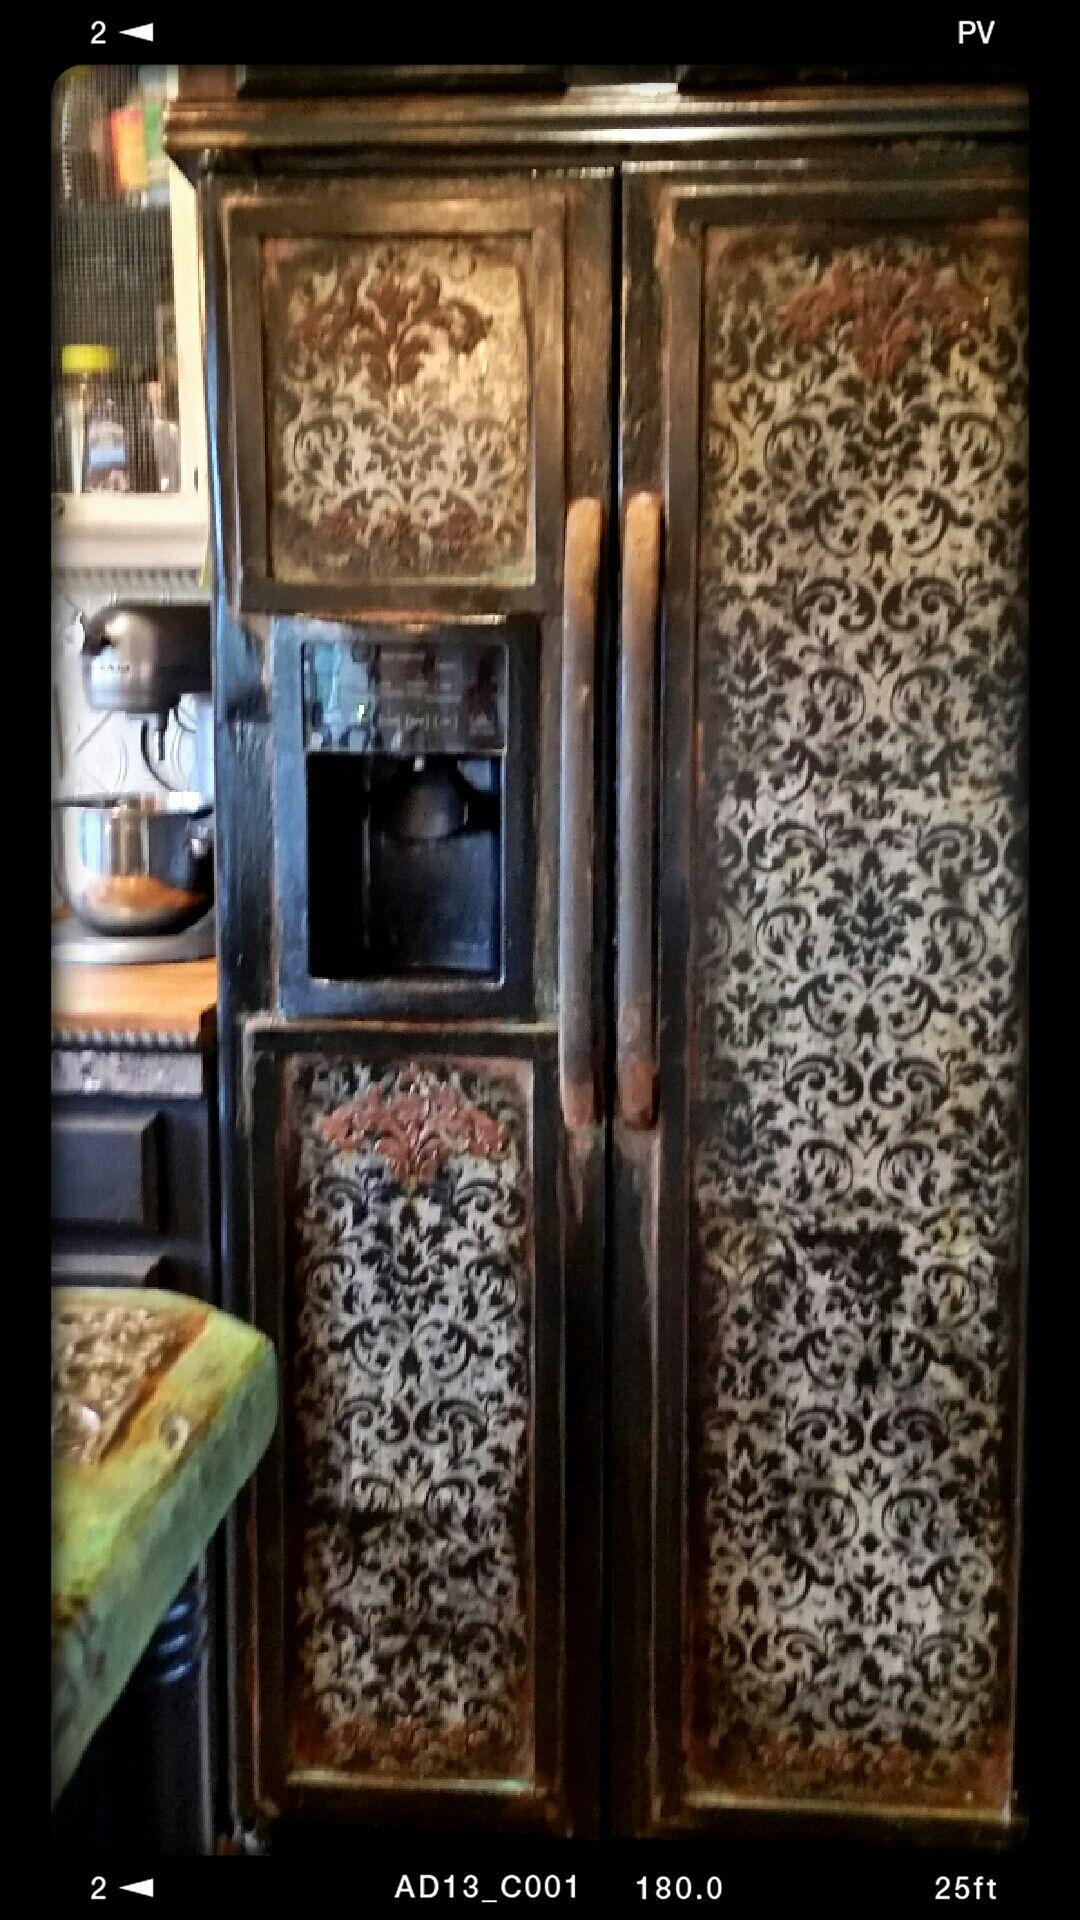 Sk S Newest Repainted Refrigerator Refrigerator Makeover Fridge Makeover Painted Fridge